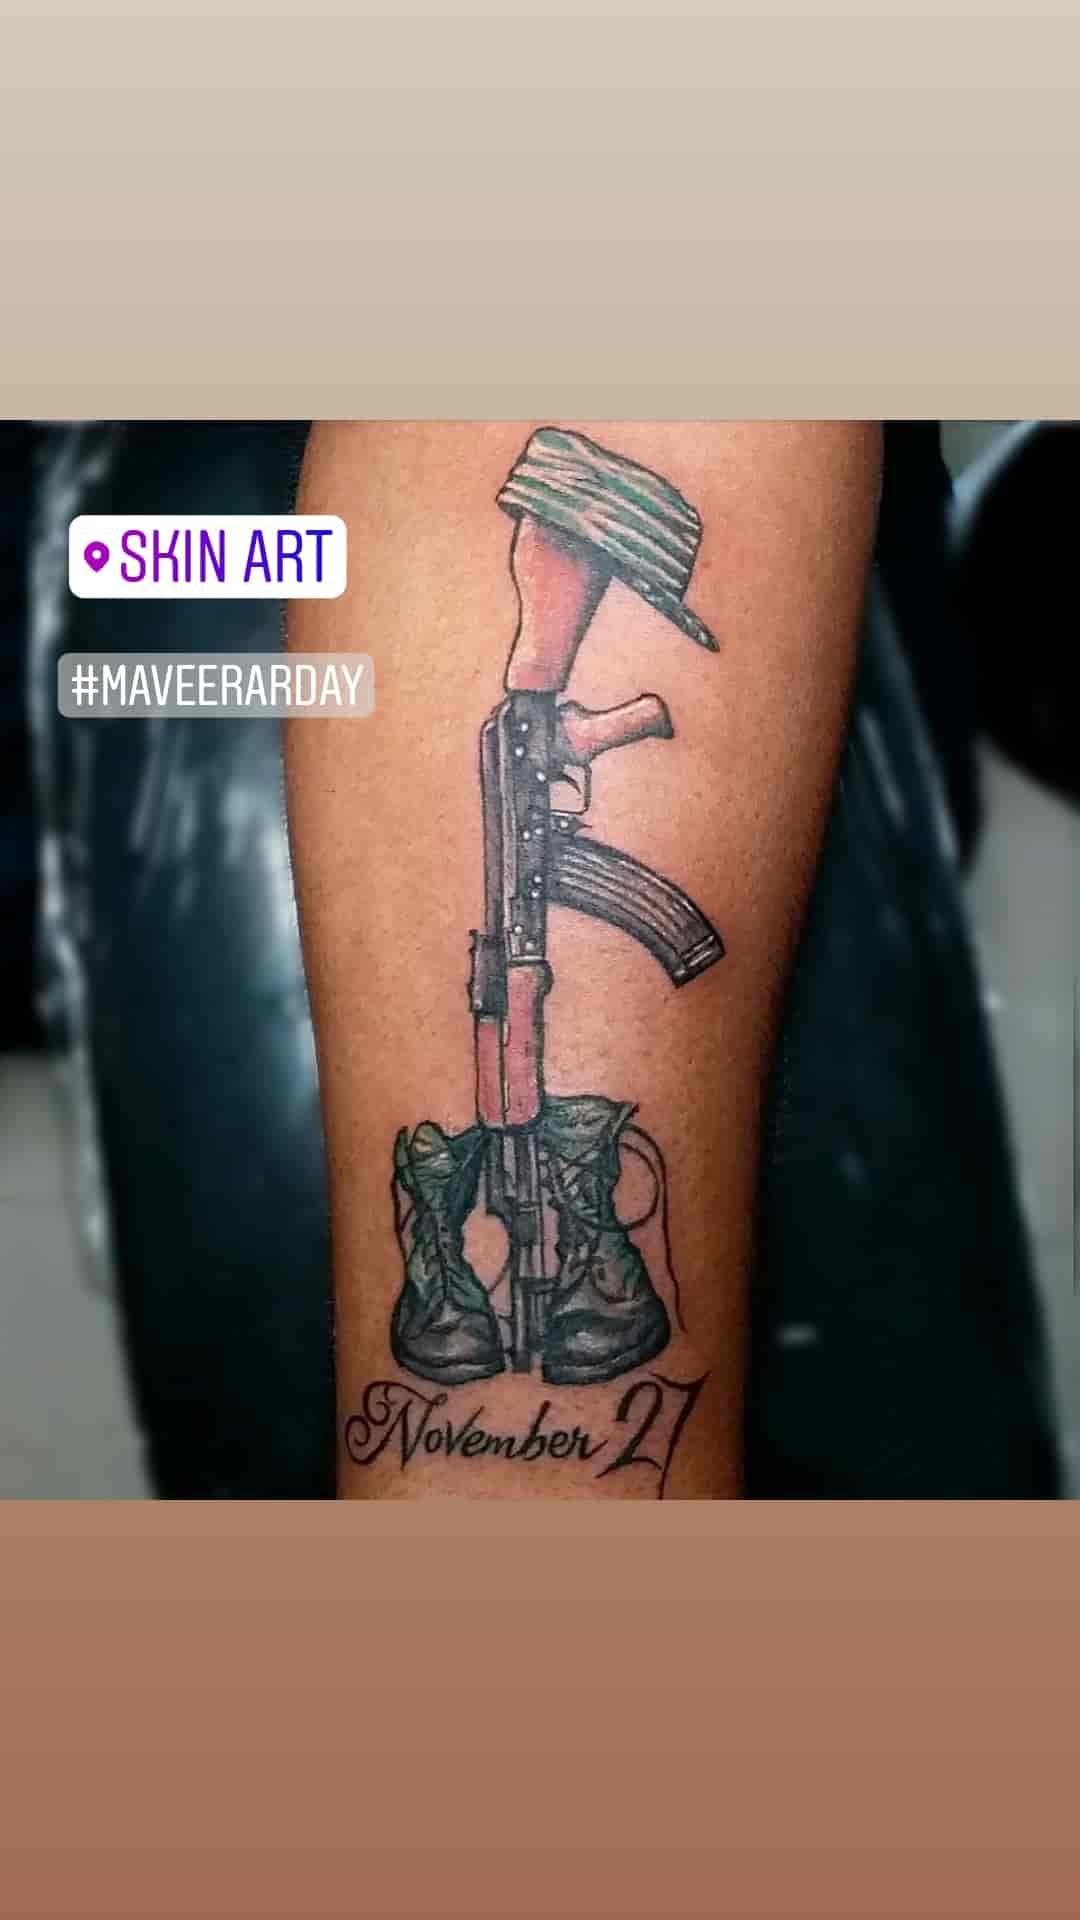 265bbbcd4 ... Skin Art Tattoo Photos, Thillai Nagar, Trichy - Tattoo Artists ...